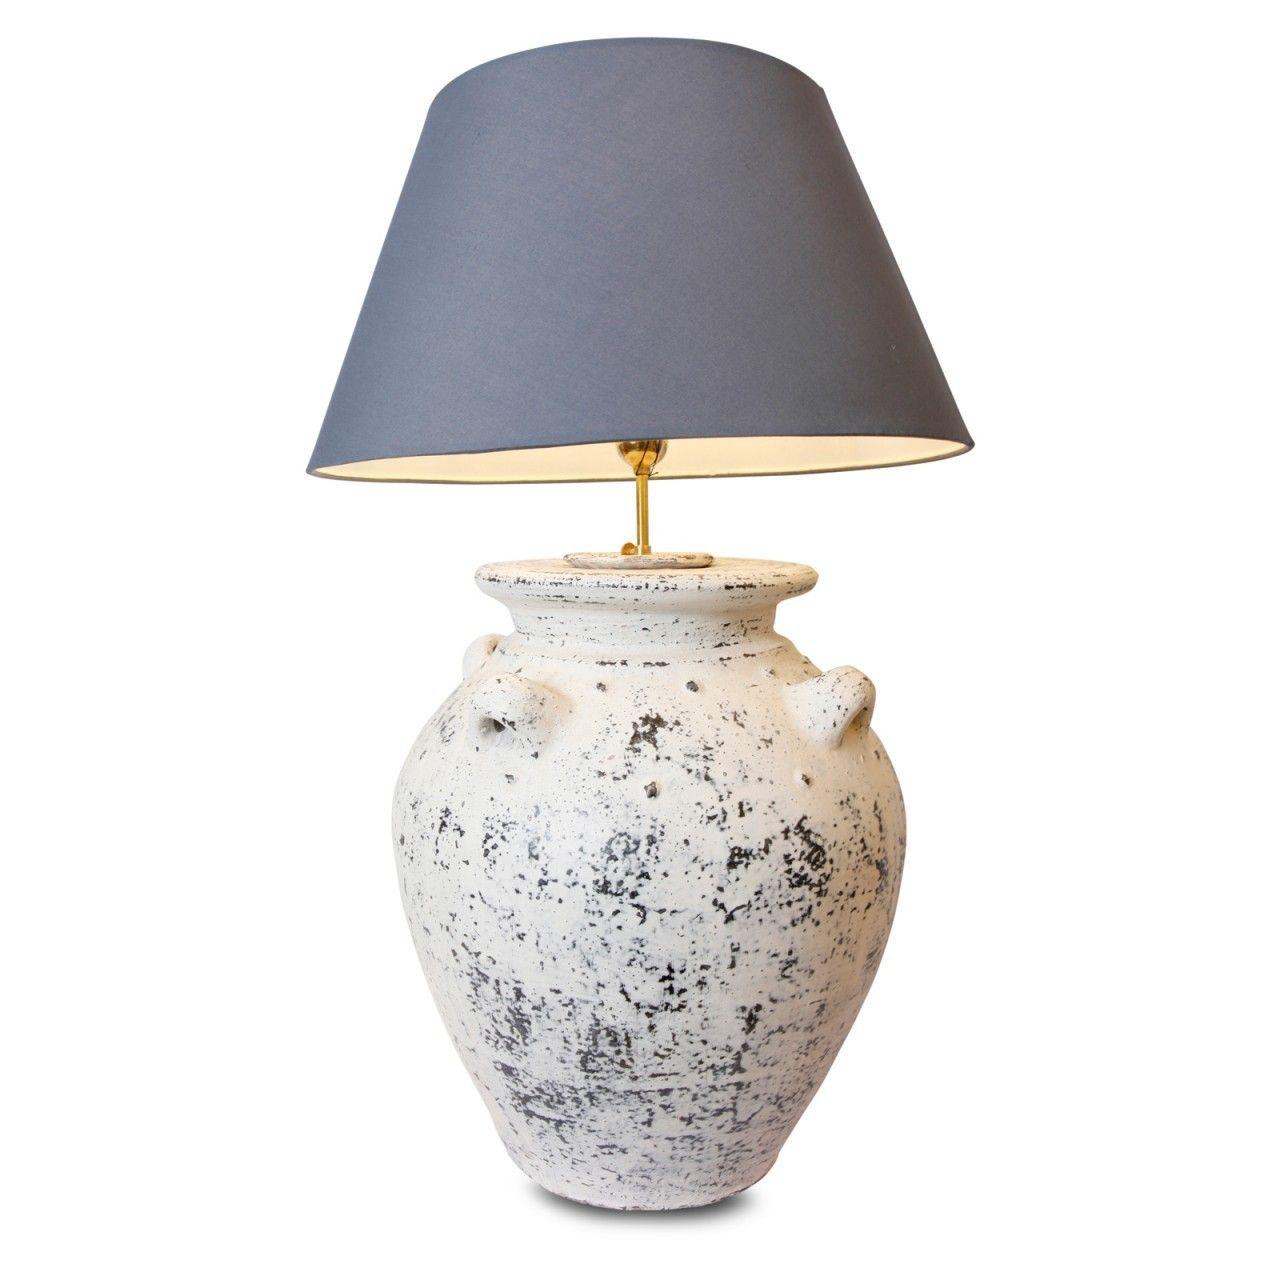 Gong online shop jarre table lamp httpgongjarre gong online shop jarre table lamp httpgong geotapseo Images